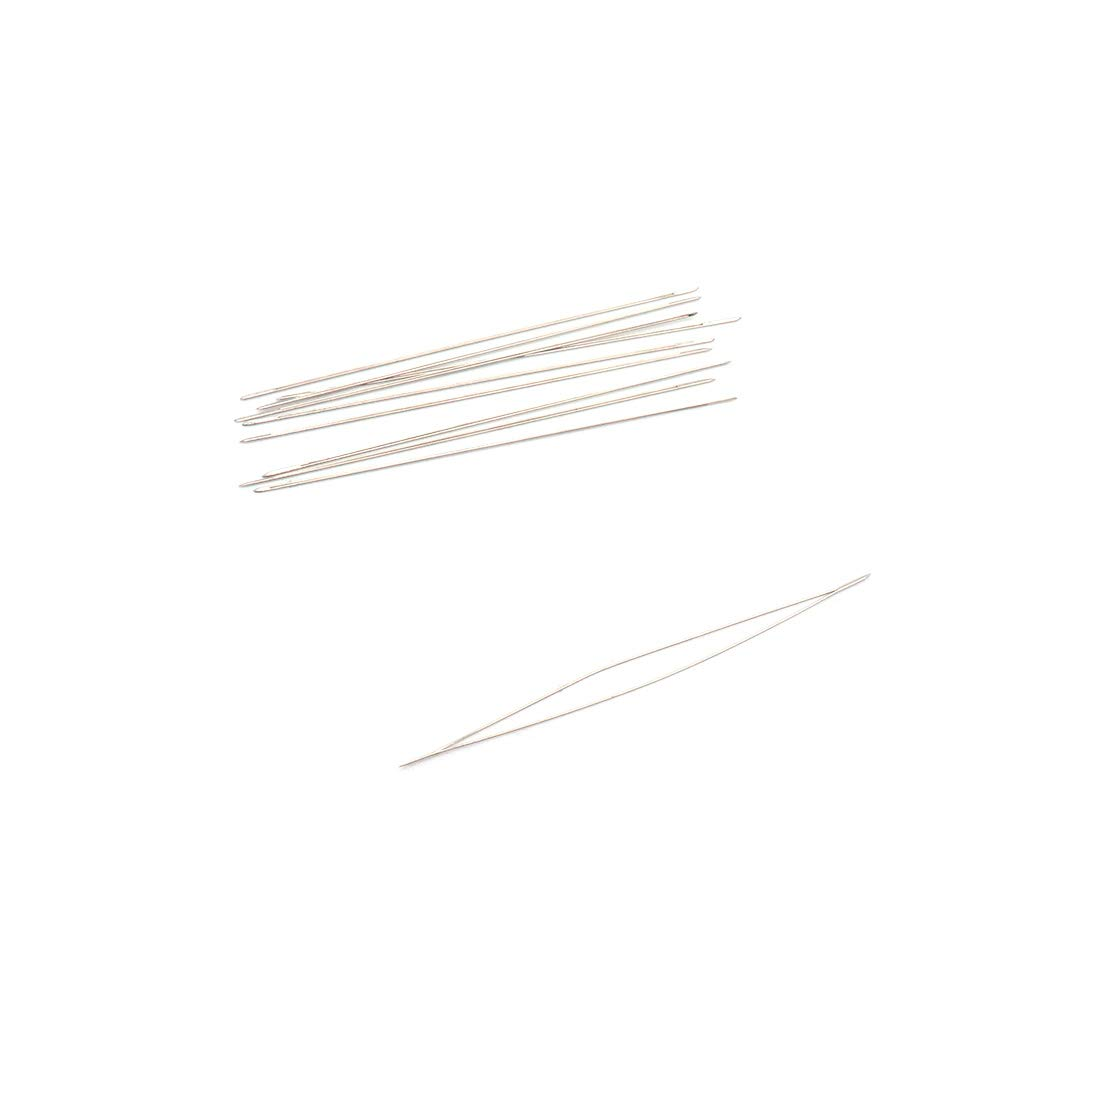 ZXHAO 5.5cm//2.2 inch Length Big Eye Beading Needles 10pcs with Needle Bottle